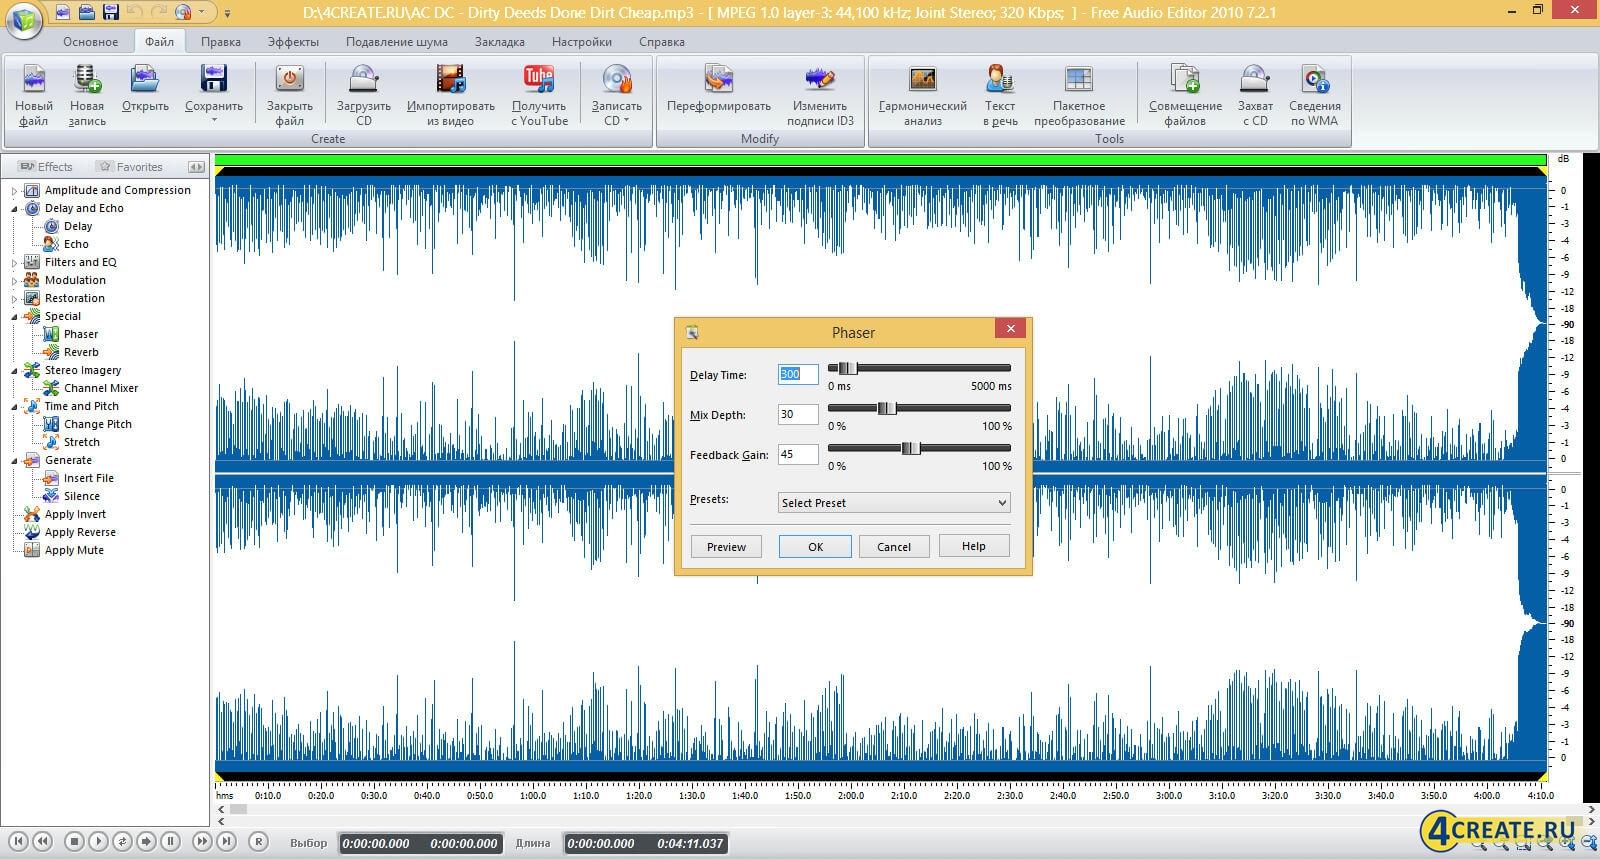 Free Audio Editor 7.2 (Скриншот 2)